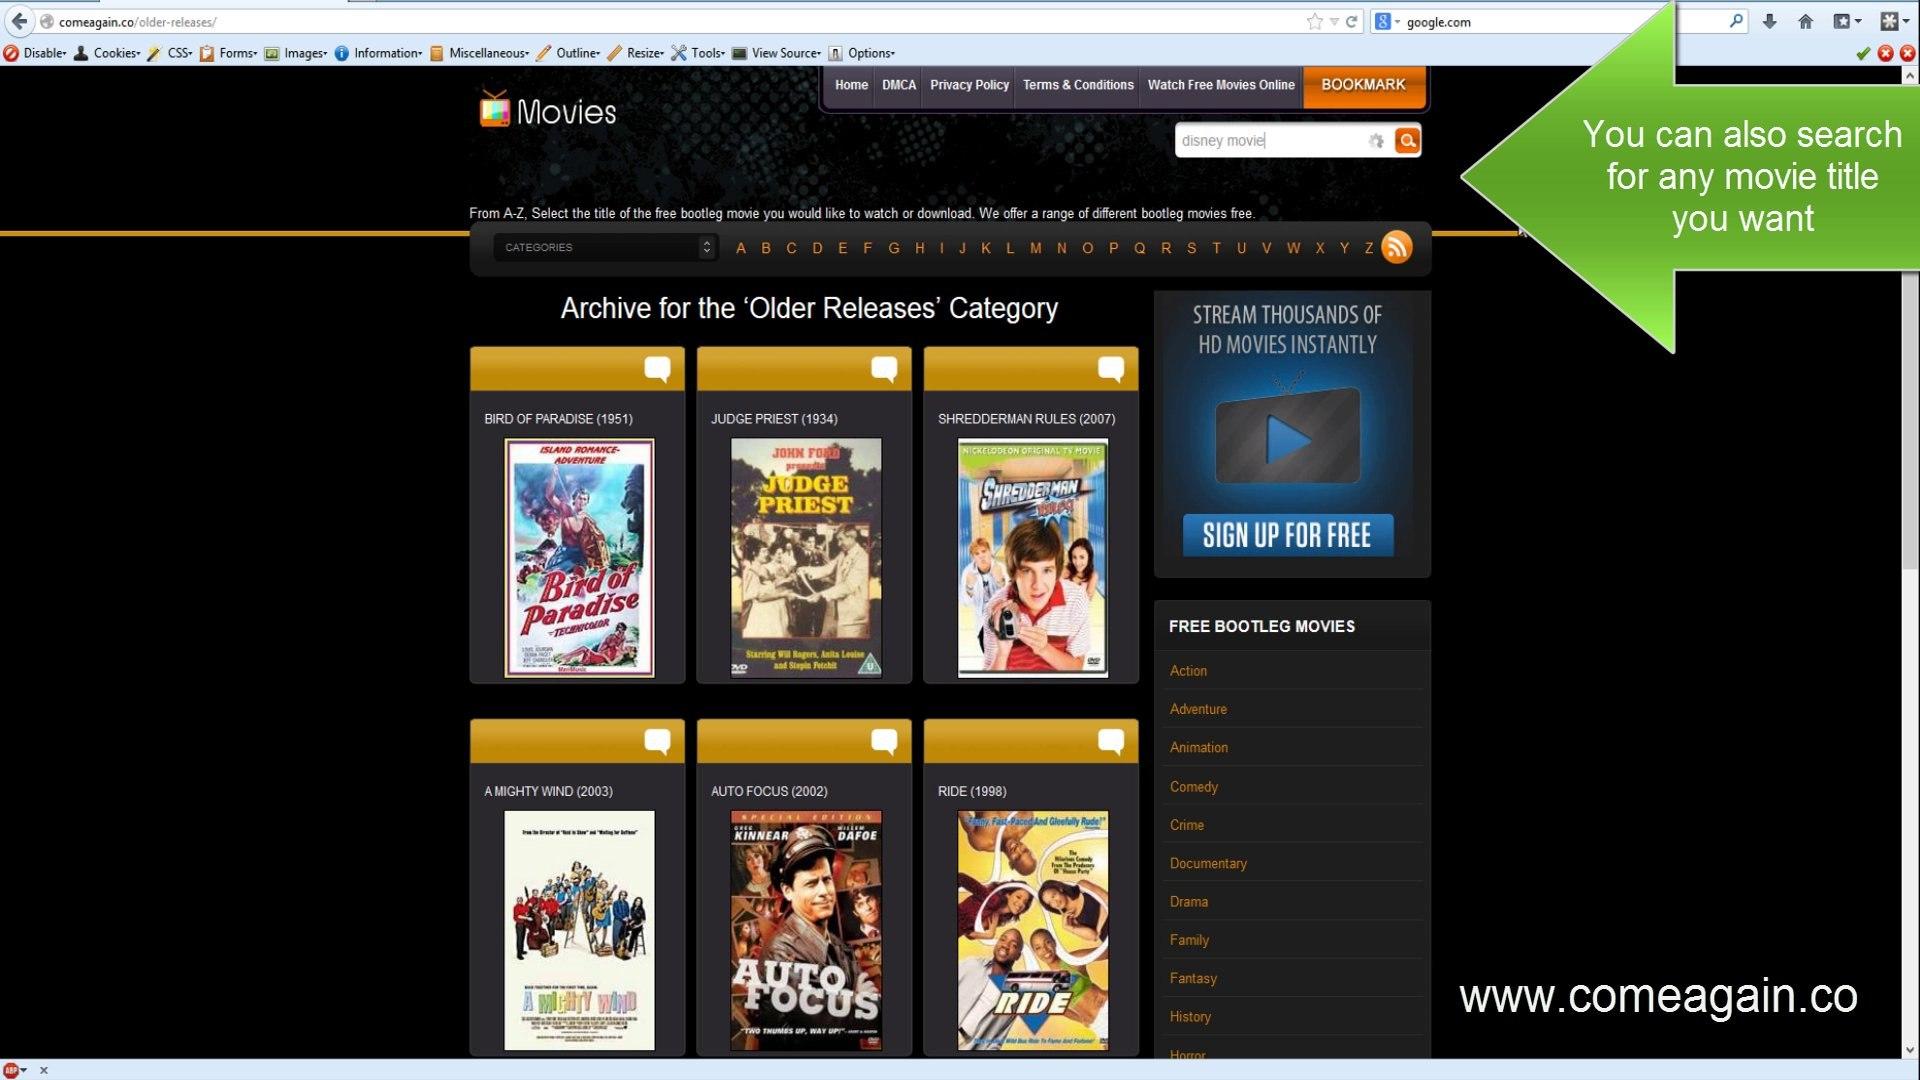 nigerian movies 2013 latest full movies